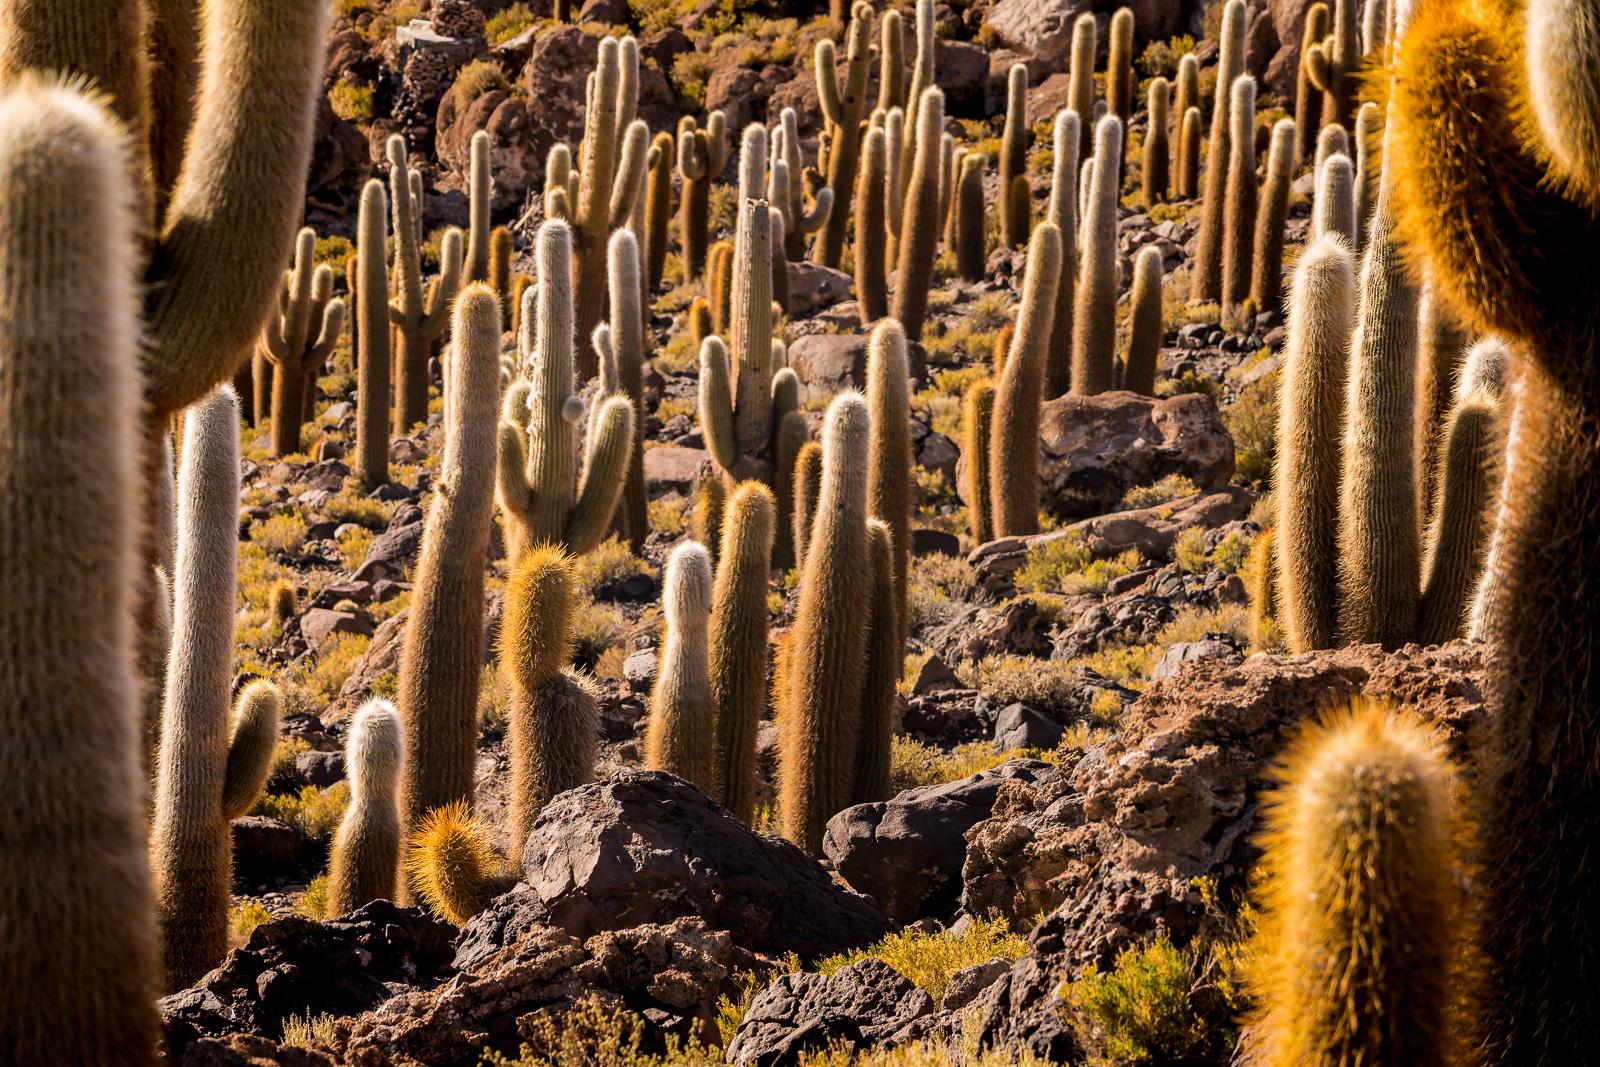 Giant beautiful cactus